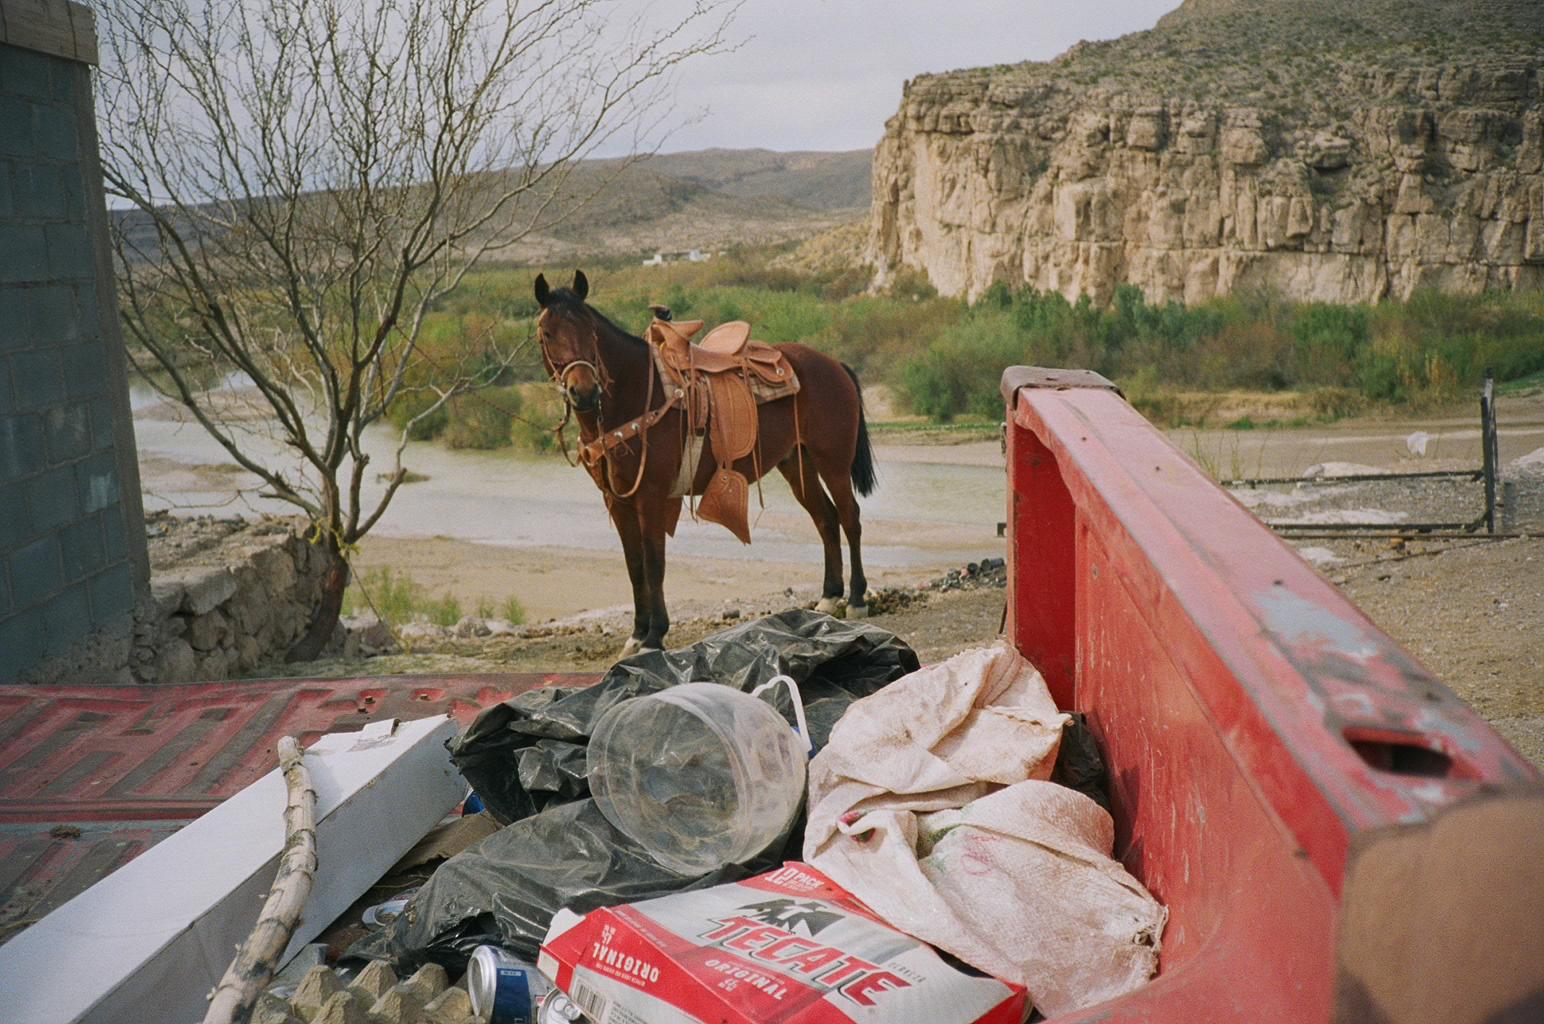 The Horse of Boquillas, Mexico, 2017